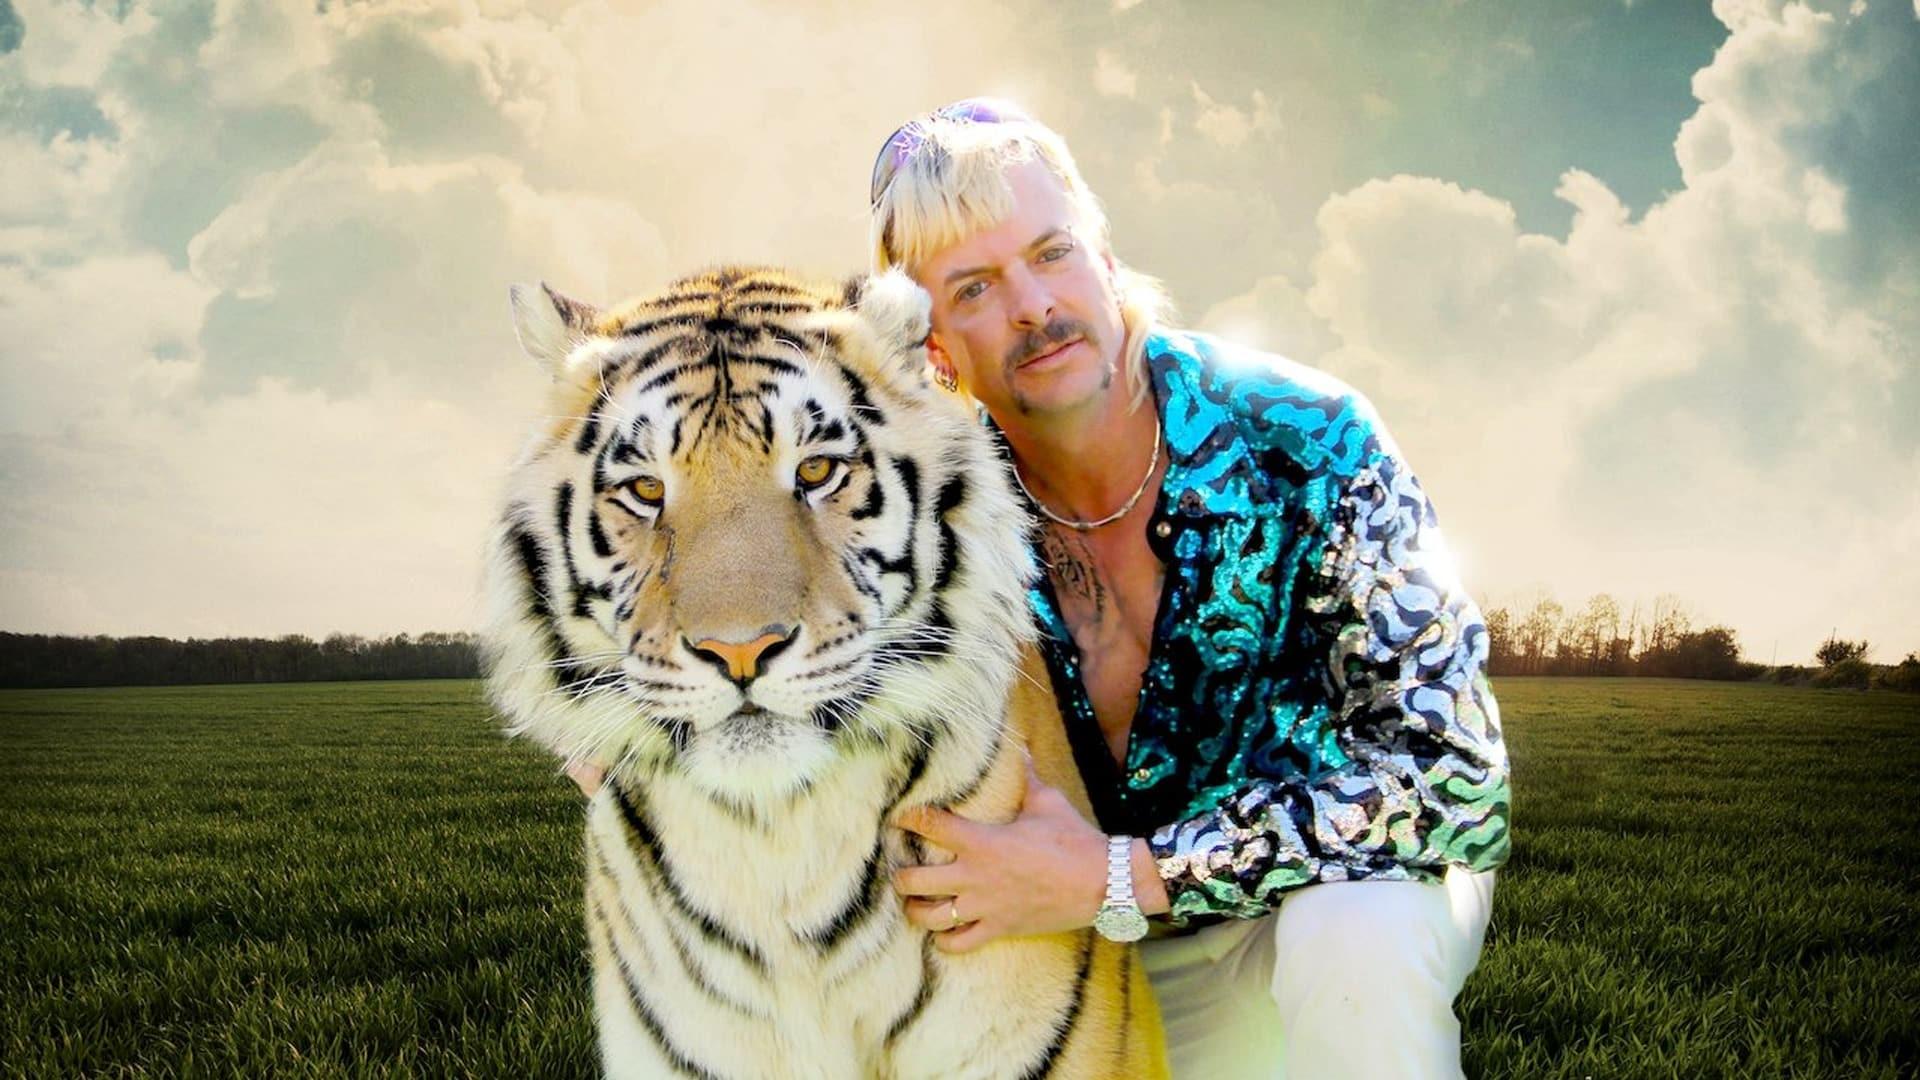 Tiger King recenzia